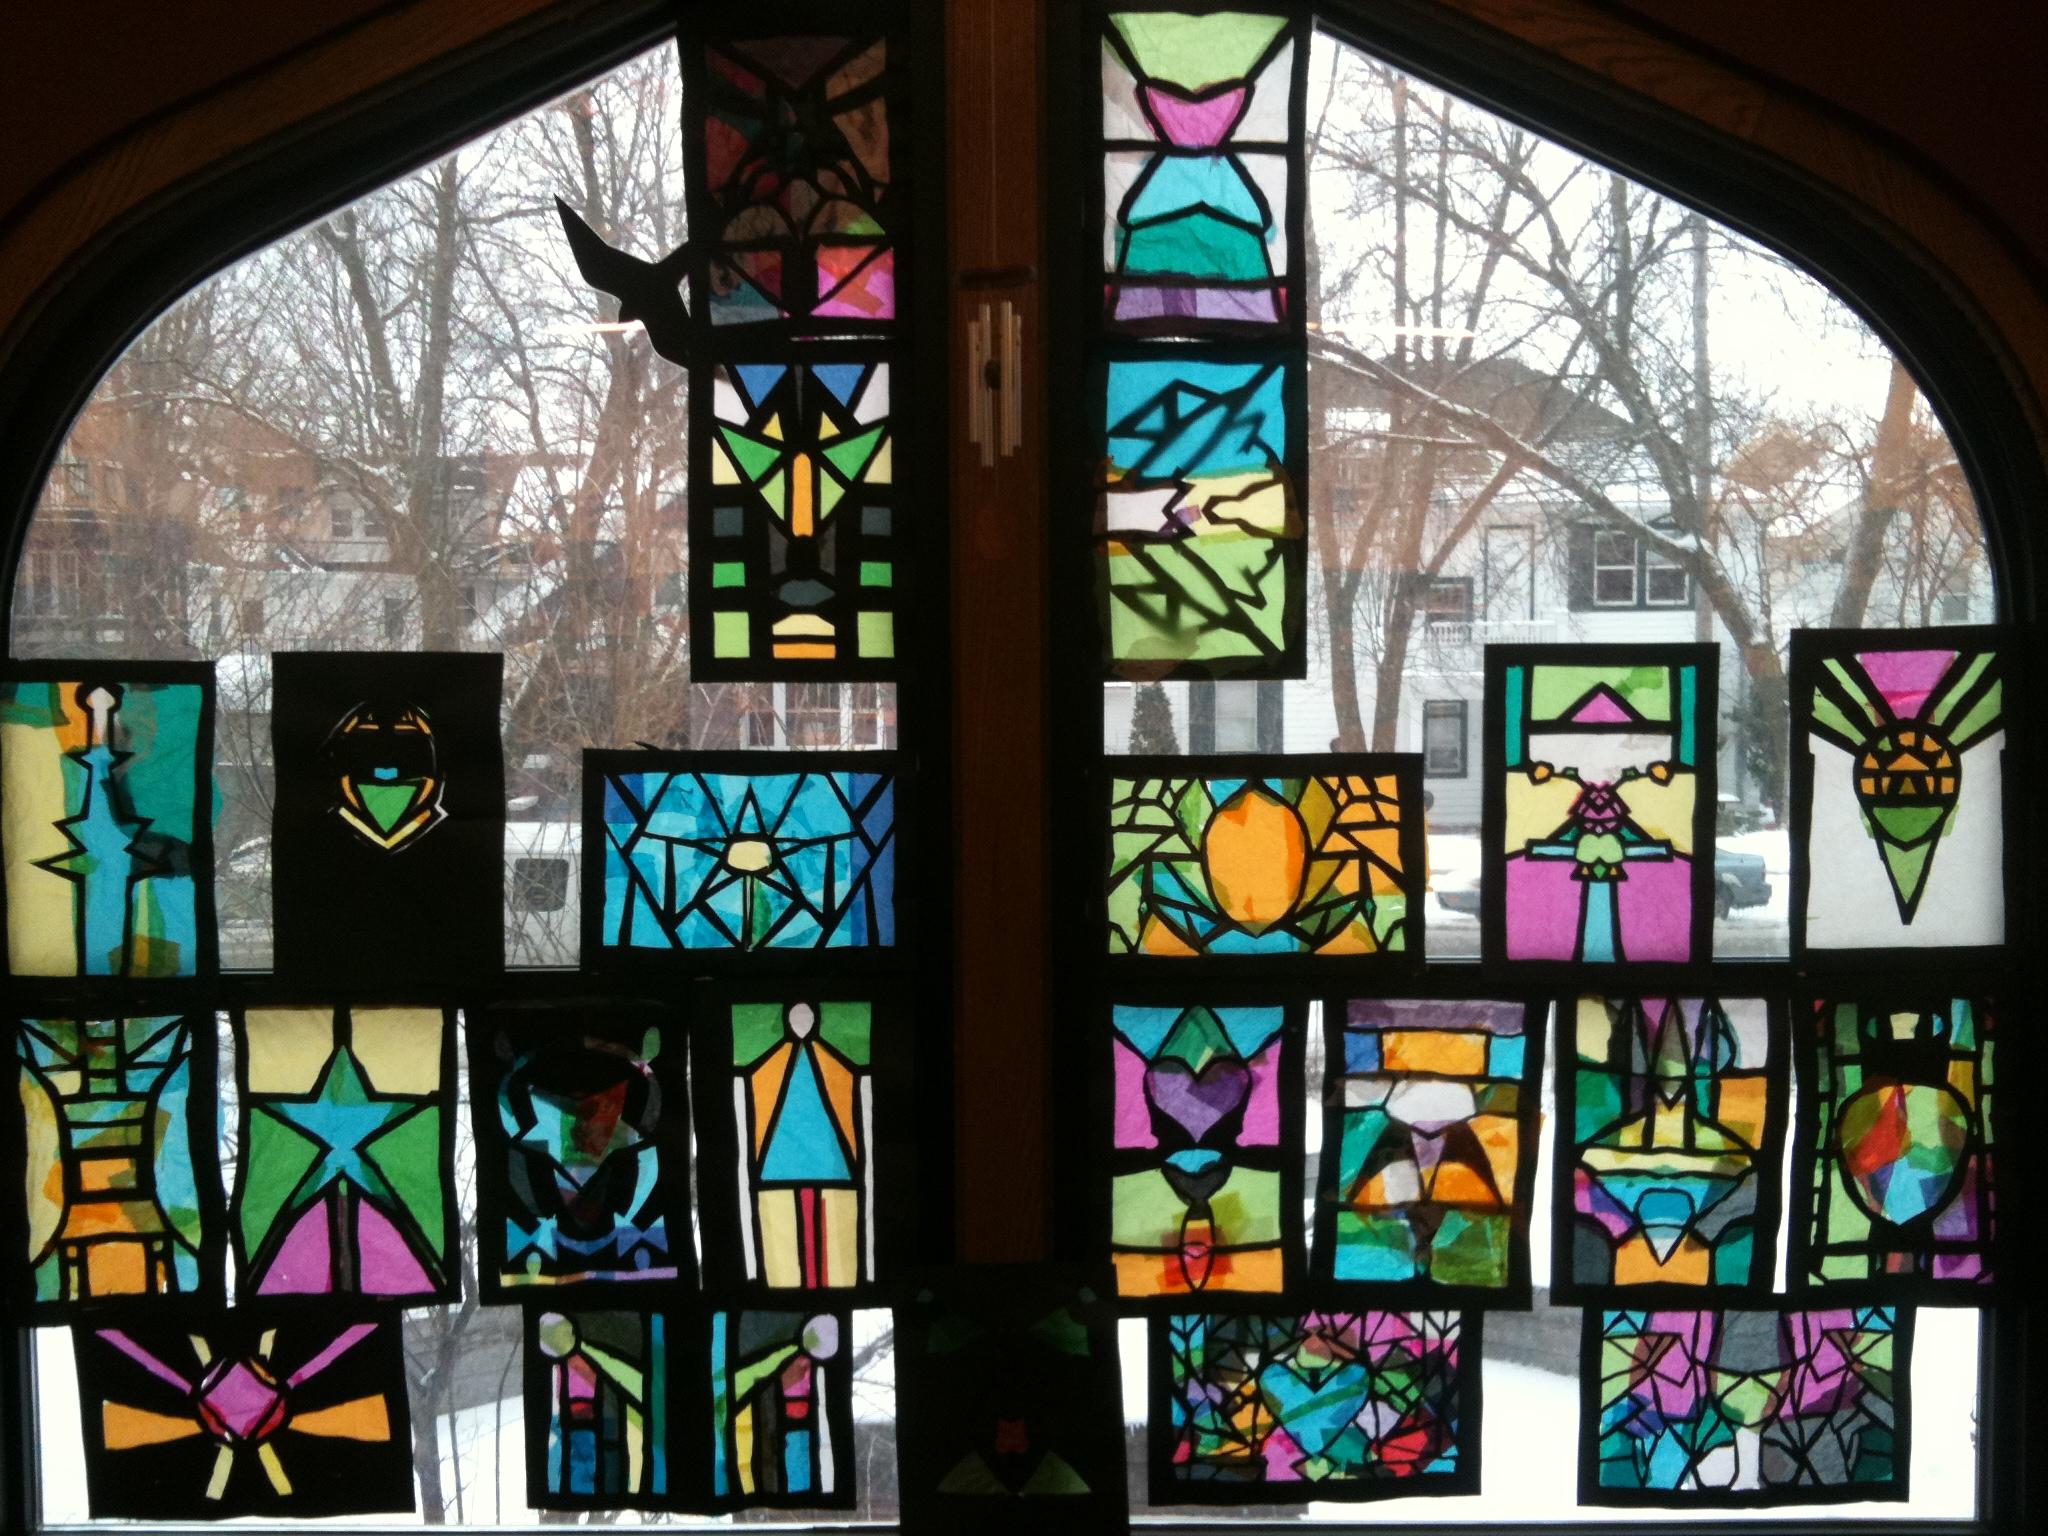 frank lloyd wright art glass o 39 keeffe 39 s backyard. Black Bedroom Furniture Sets. Home Design Ideas